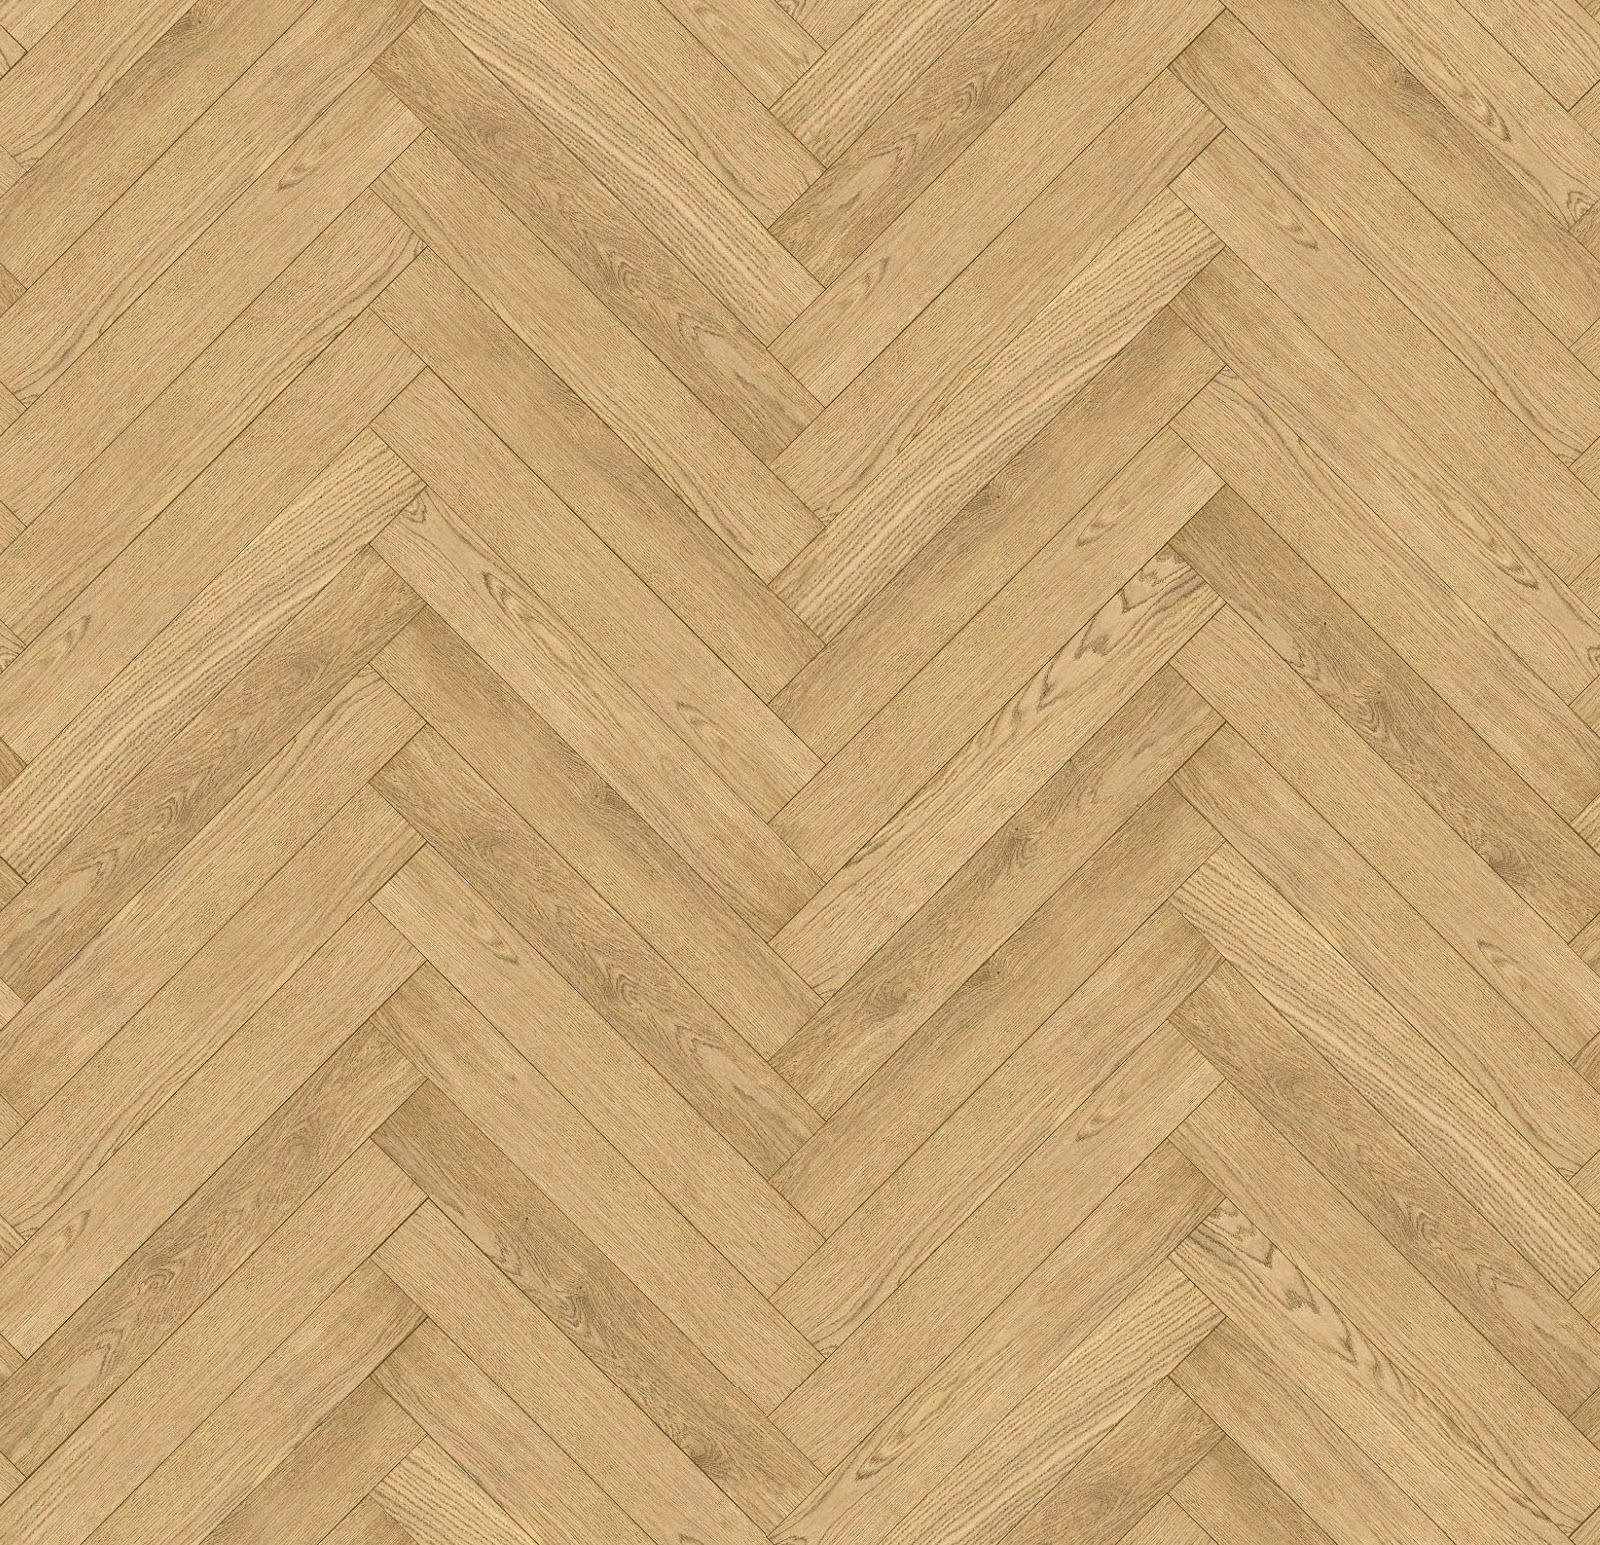 Seamless Wood Parquet Texture Maps Texturise Parquet Texture Herringbone Wood Floor Wood Floor Texture